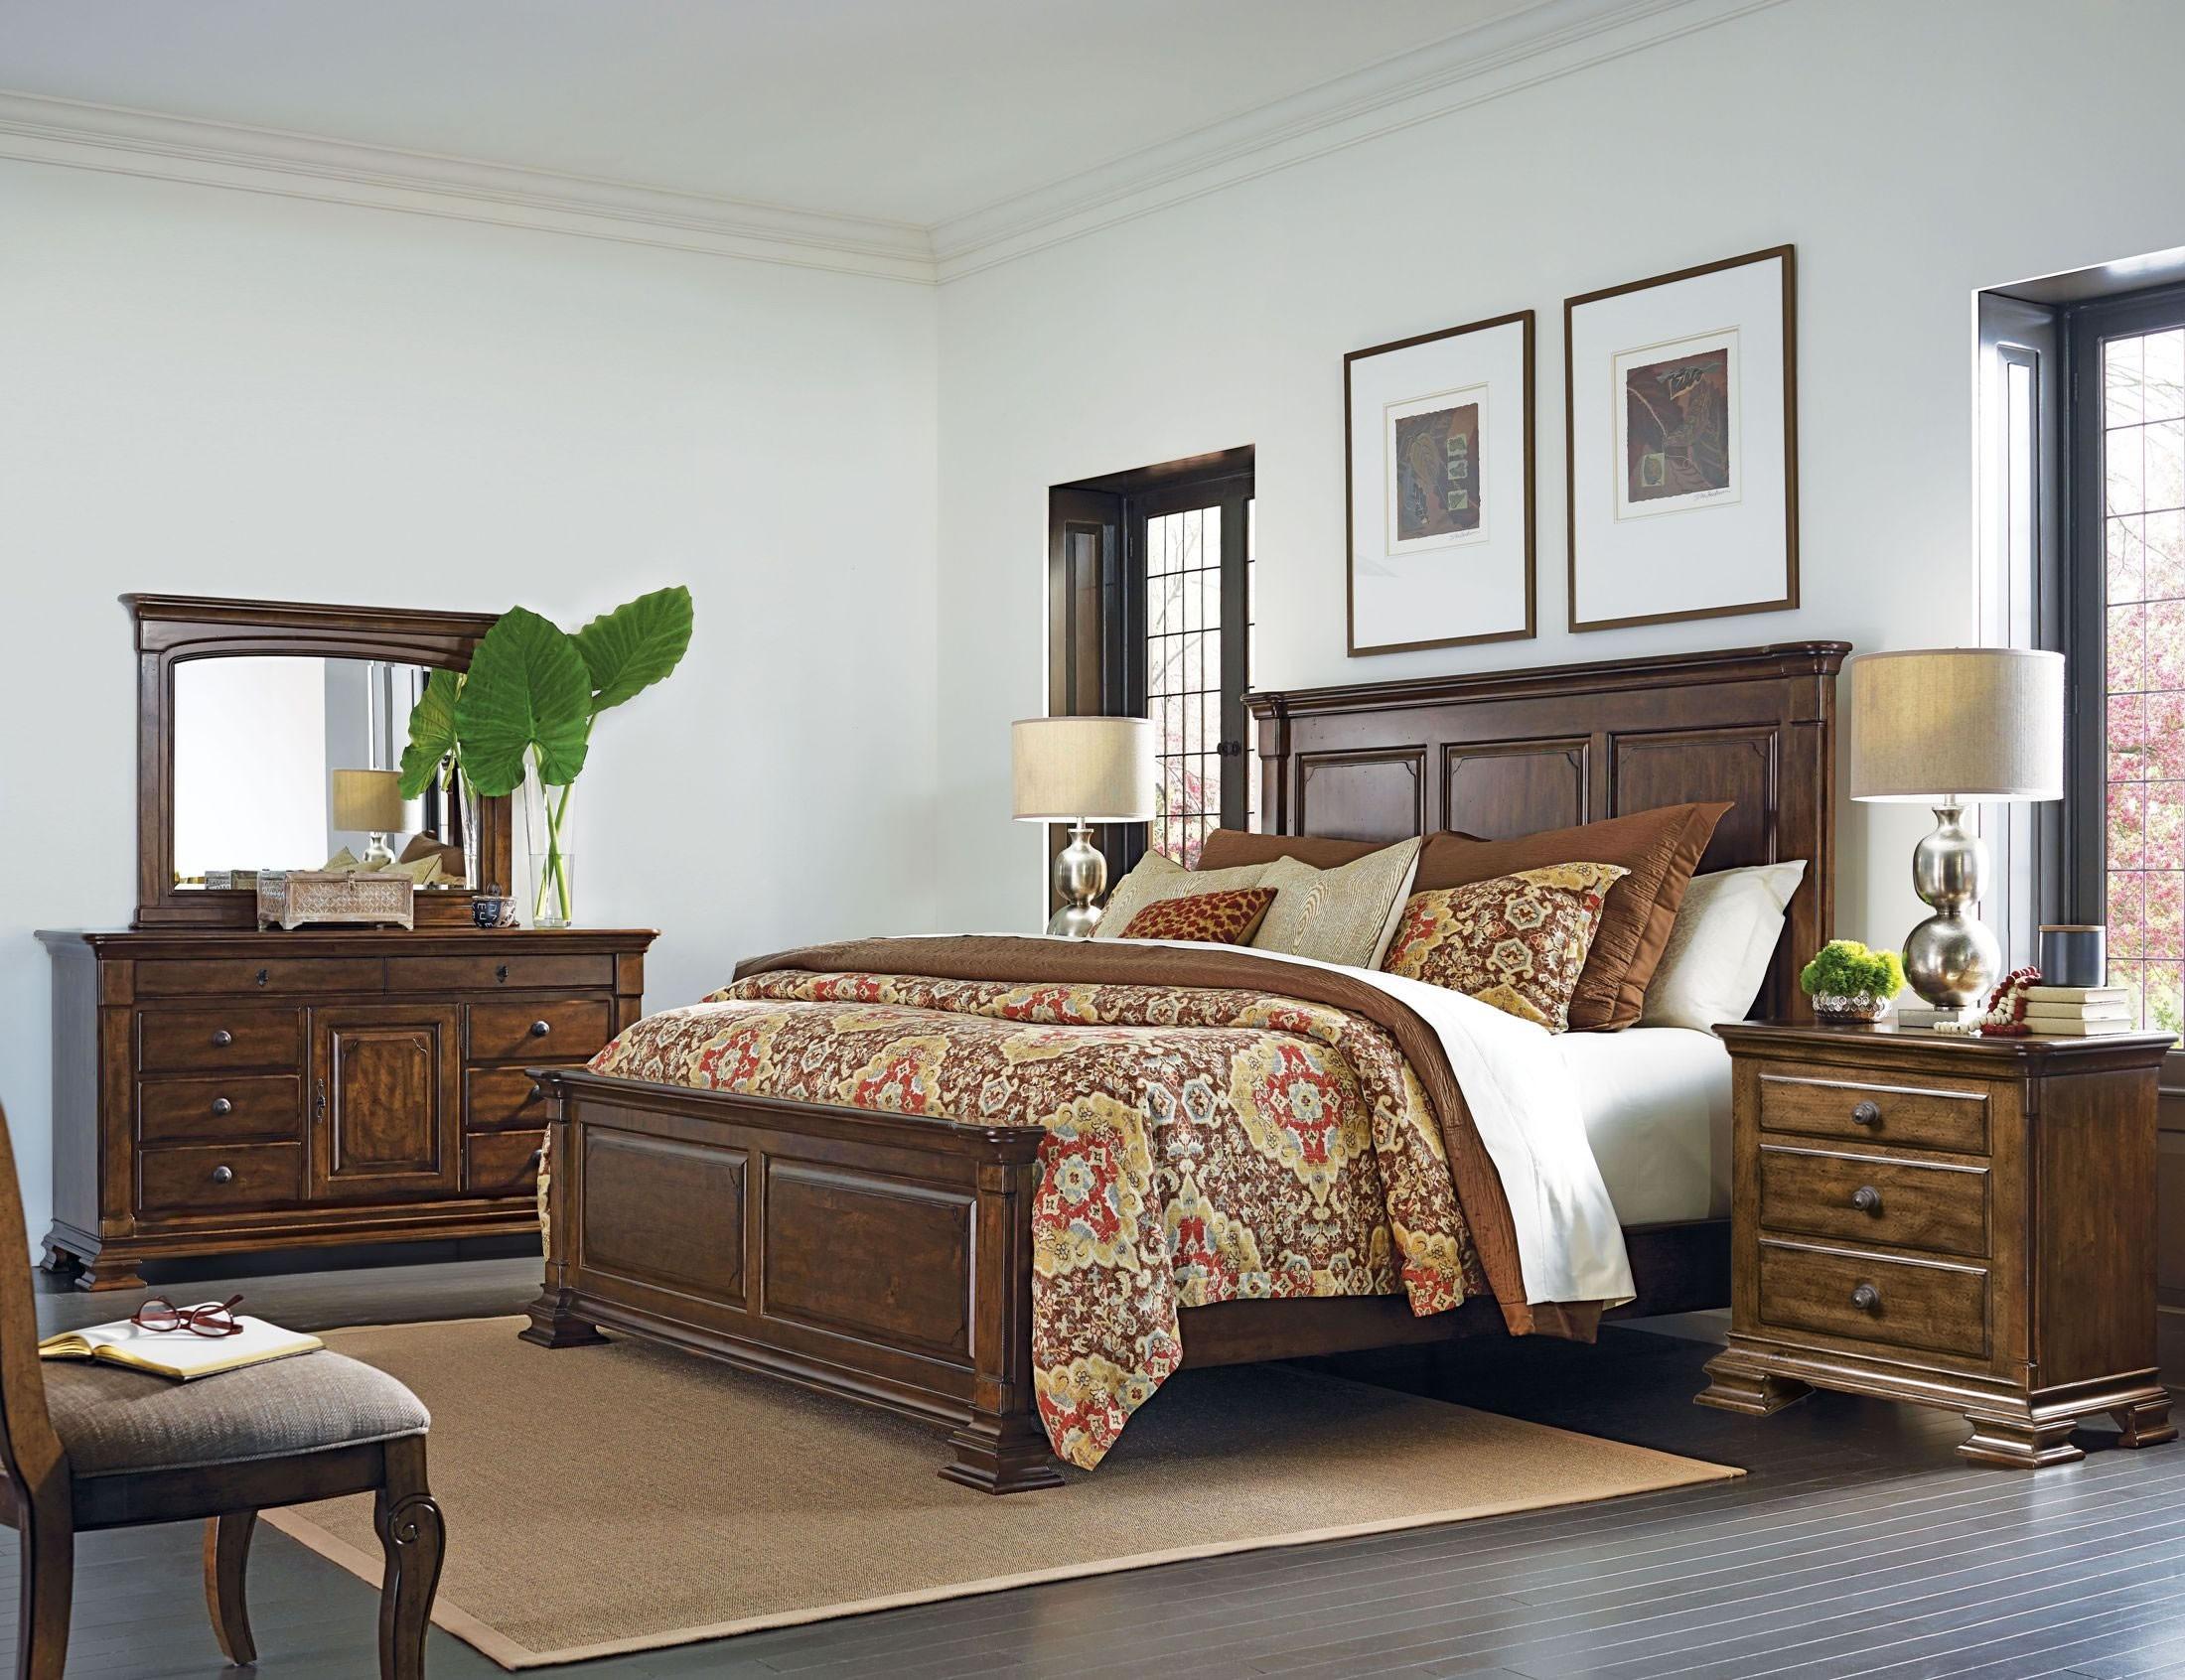 portolone monteri panel bedroom set from kincaid furniture coleman furniture. Black Bedroom Furniture Sets. Home Design Ideas